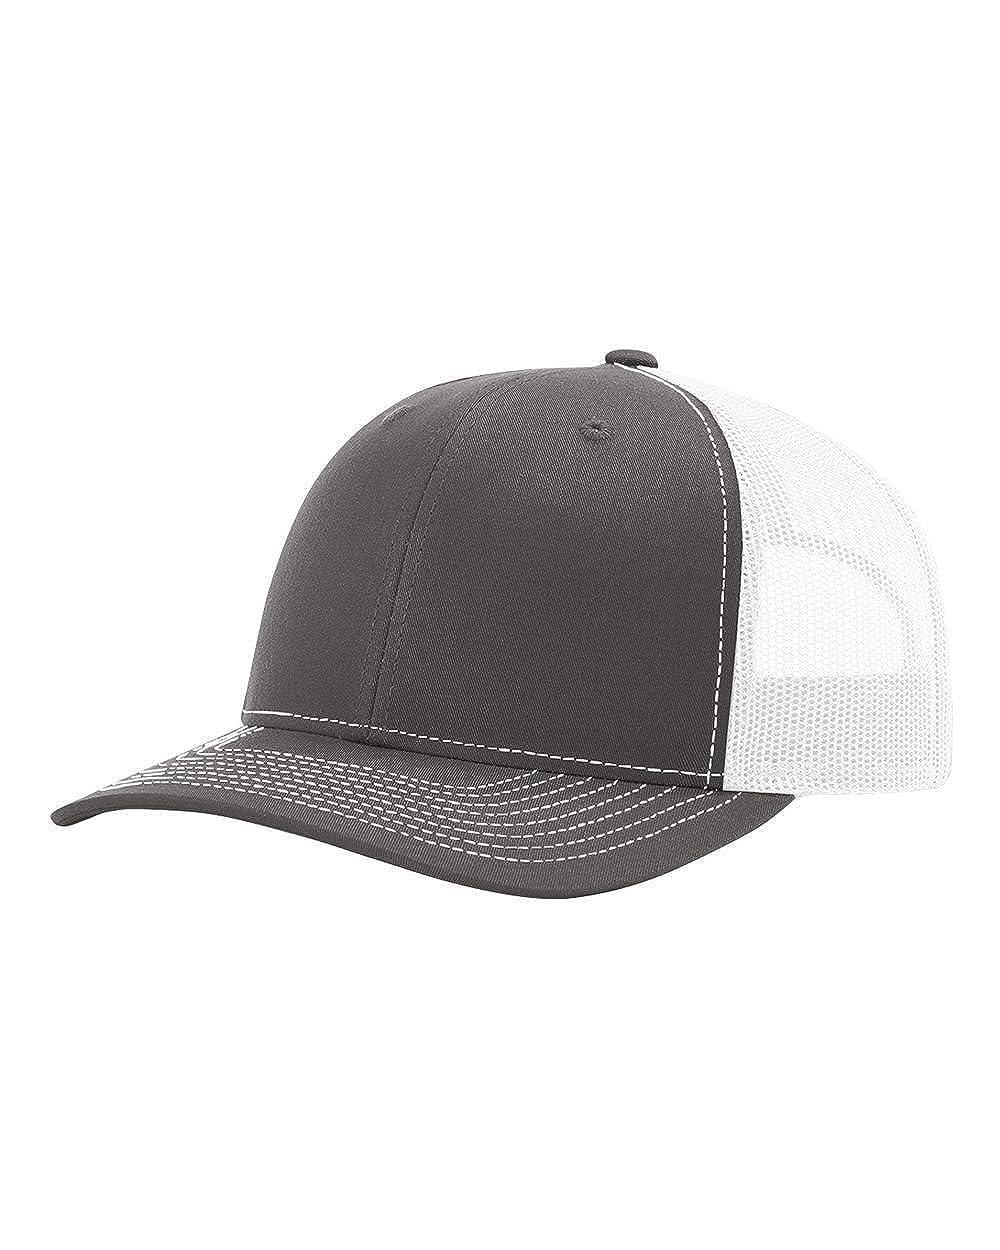 fb370465 Amazon.com: Richardson 115 LOW PRO TRUCKER BLANK BASEBALL CAP HAT: Clothing